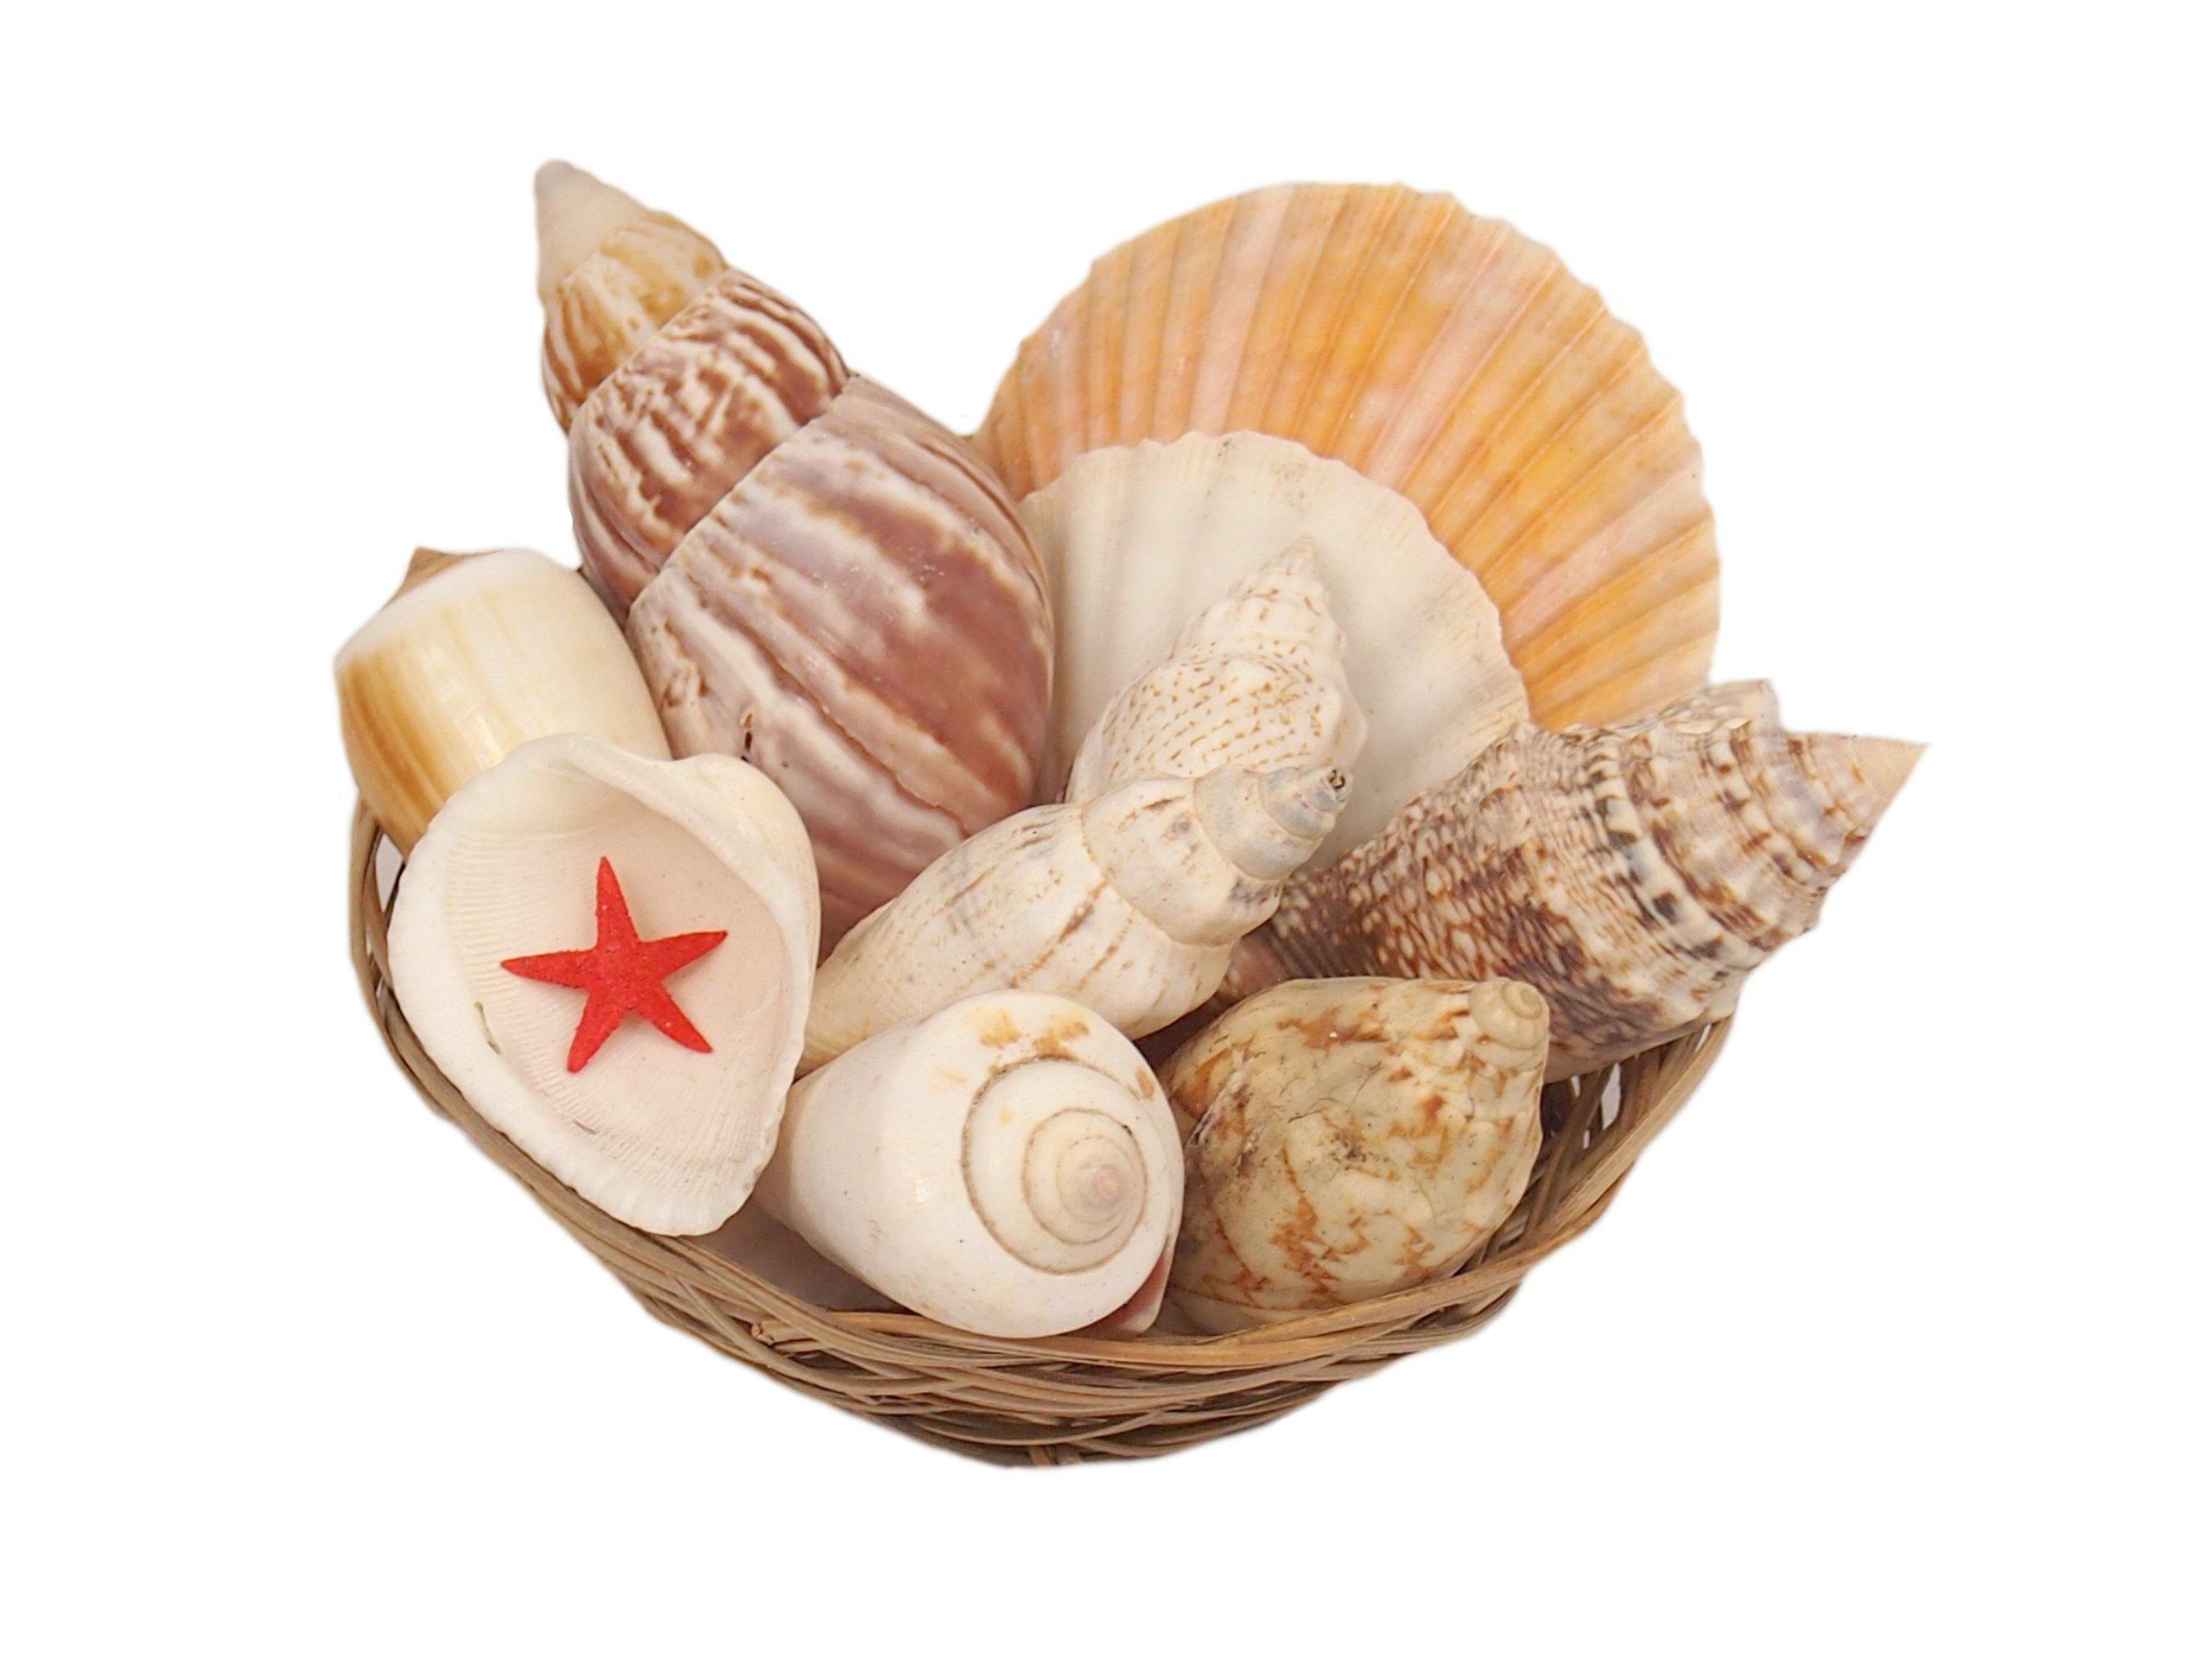 Shells Seashells Extra Mix Dekorácie Nákupný košík 150g